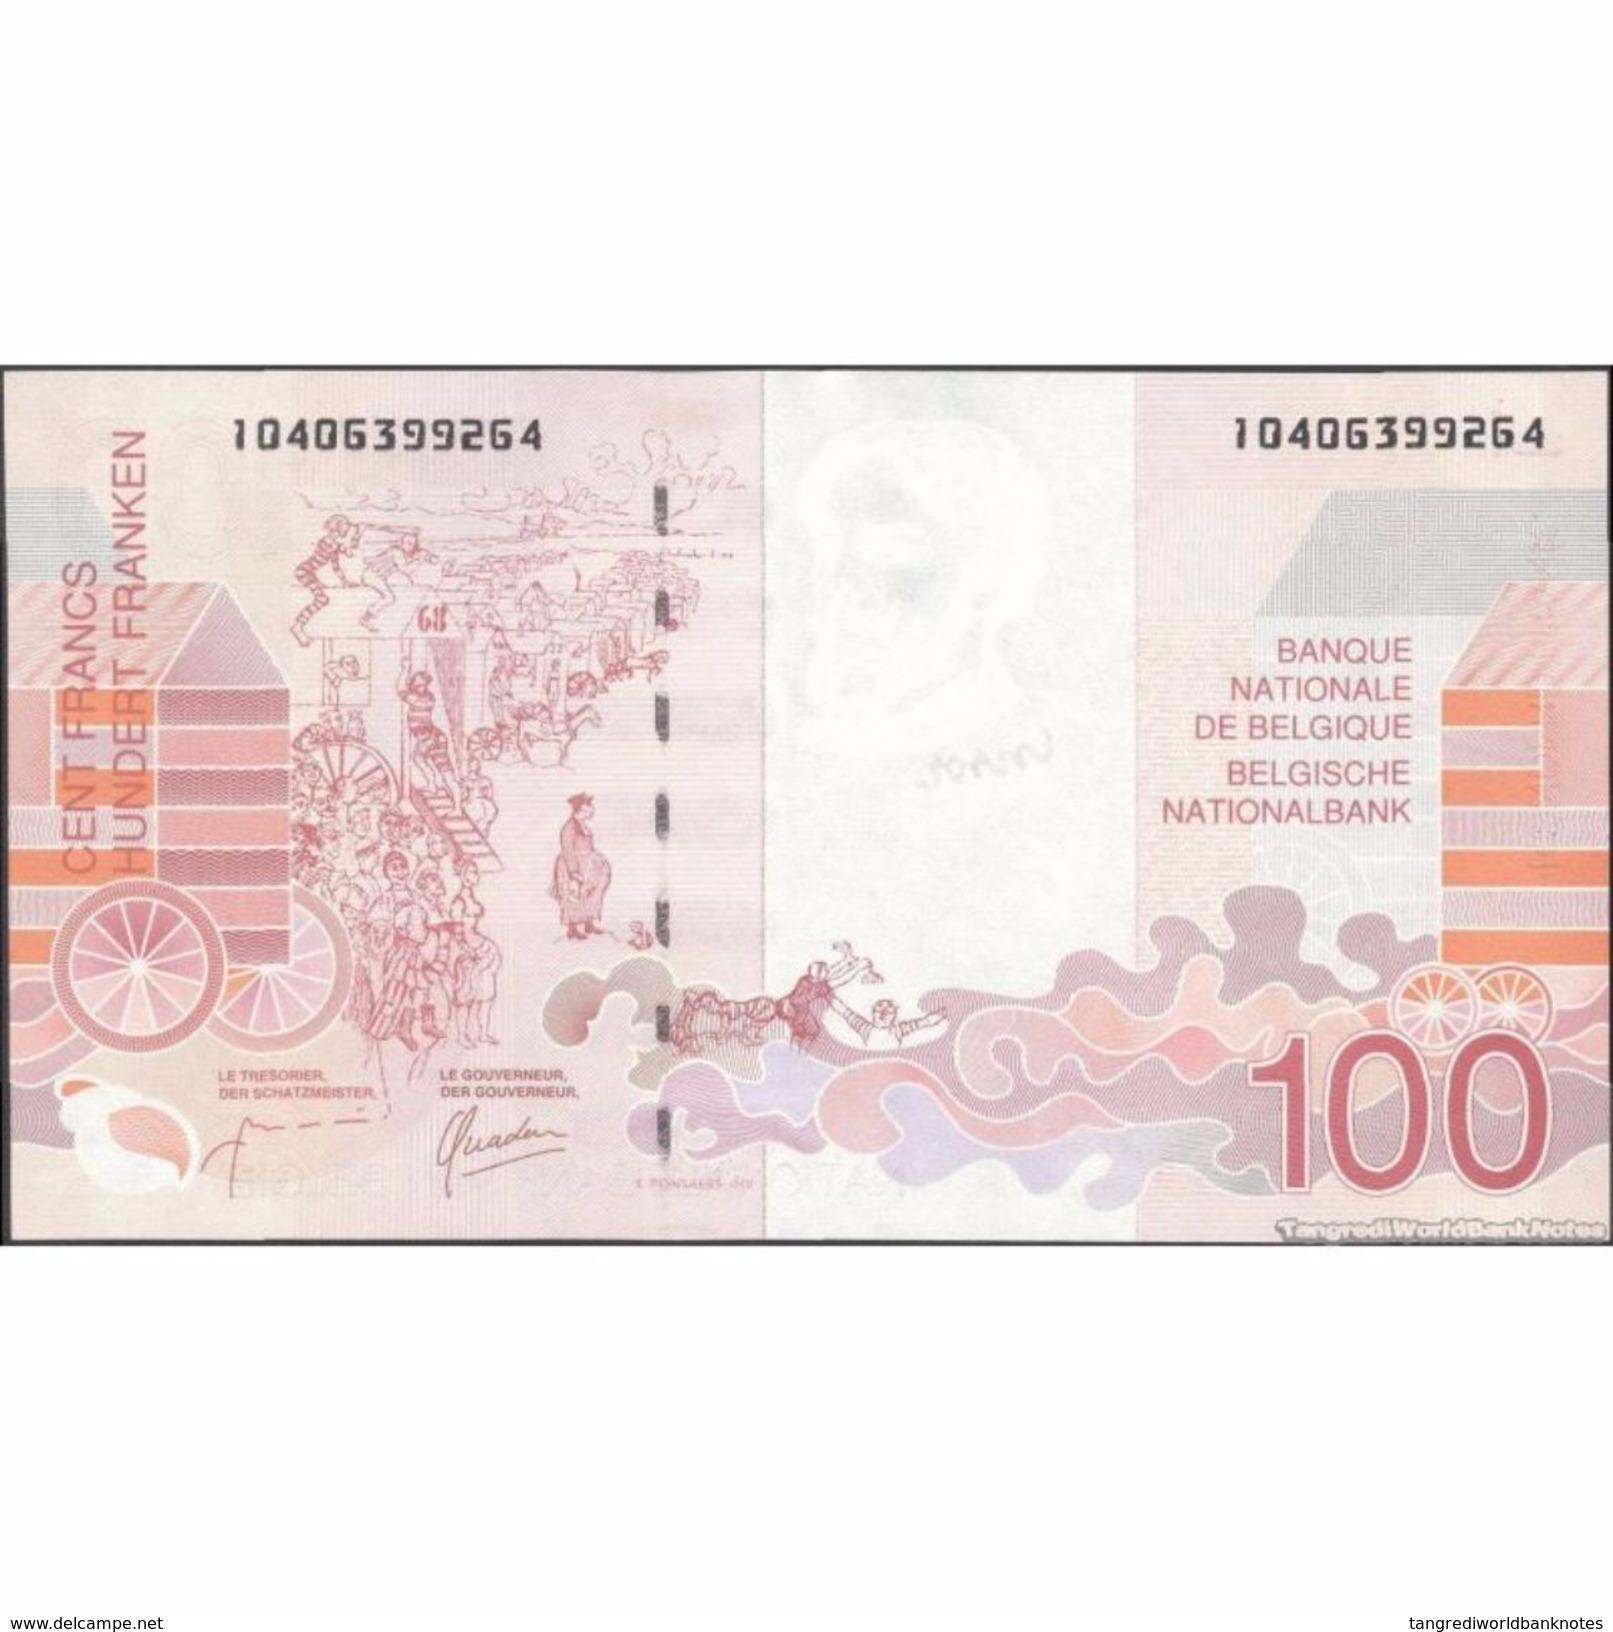 TWN - BELGIUM 147b - 100 Francs 1995-01 10406399XXX - Signatures: Masai & Quaden UNC - Altri